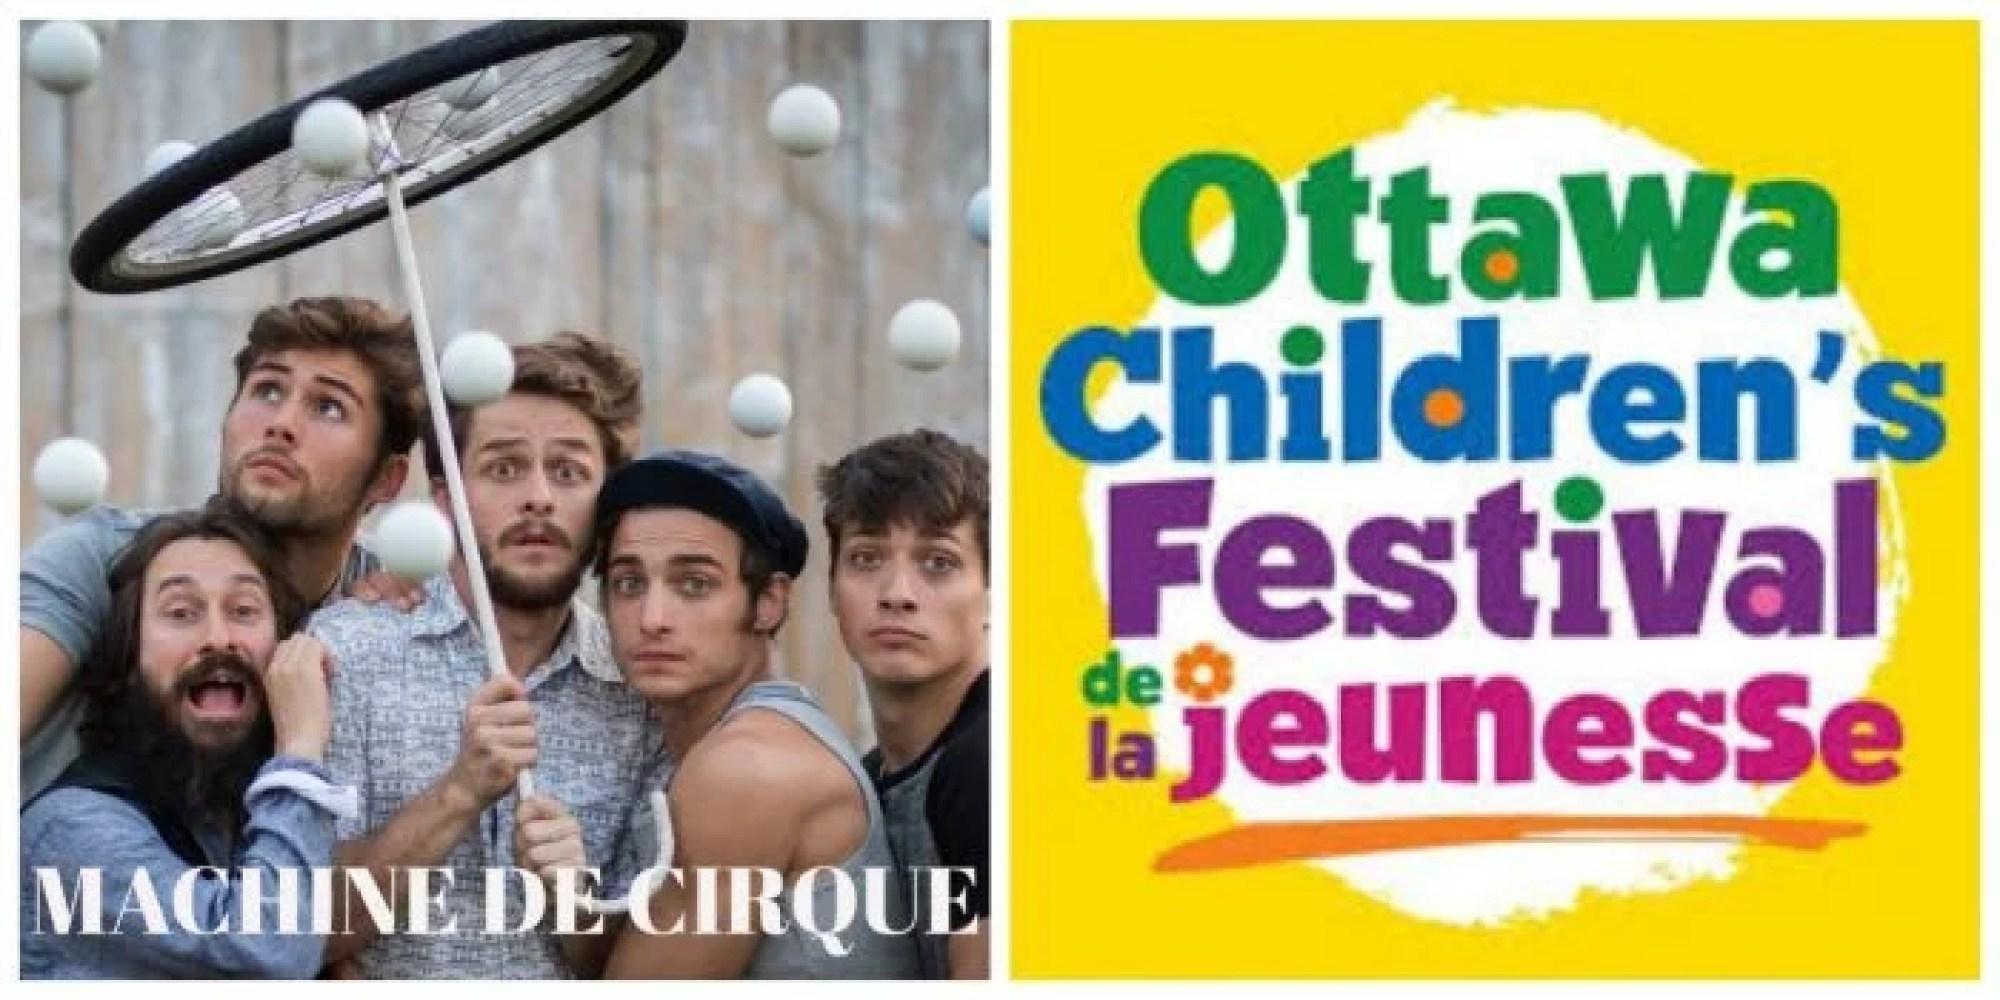 Machine De Cirque - Ottawa Children's Festival